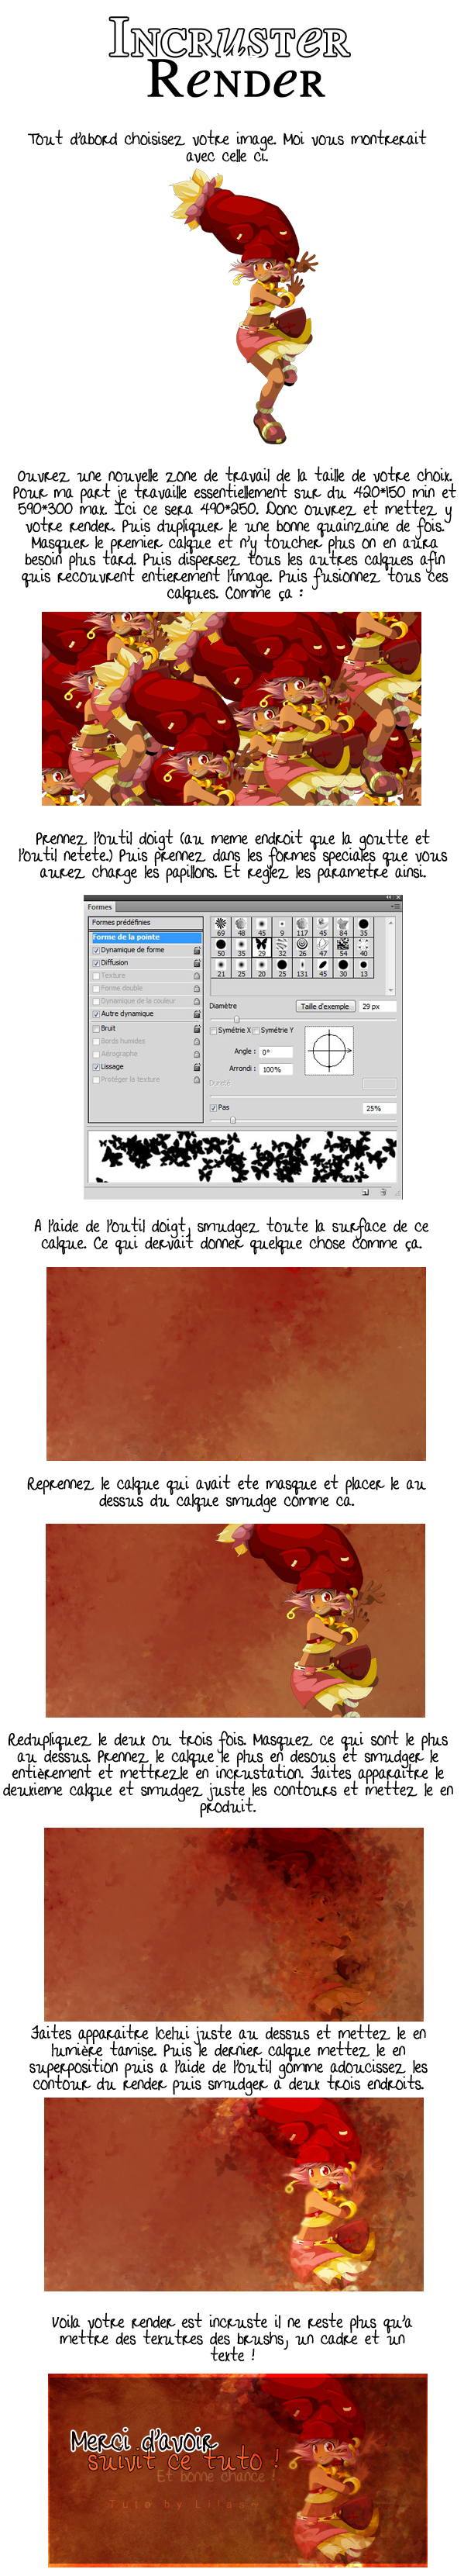 [CS4] Incruster un render 312065Sanstitre1